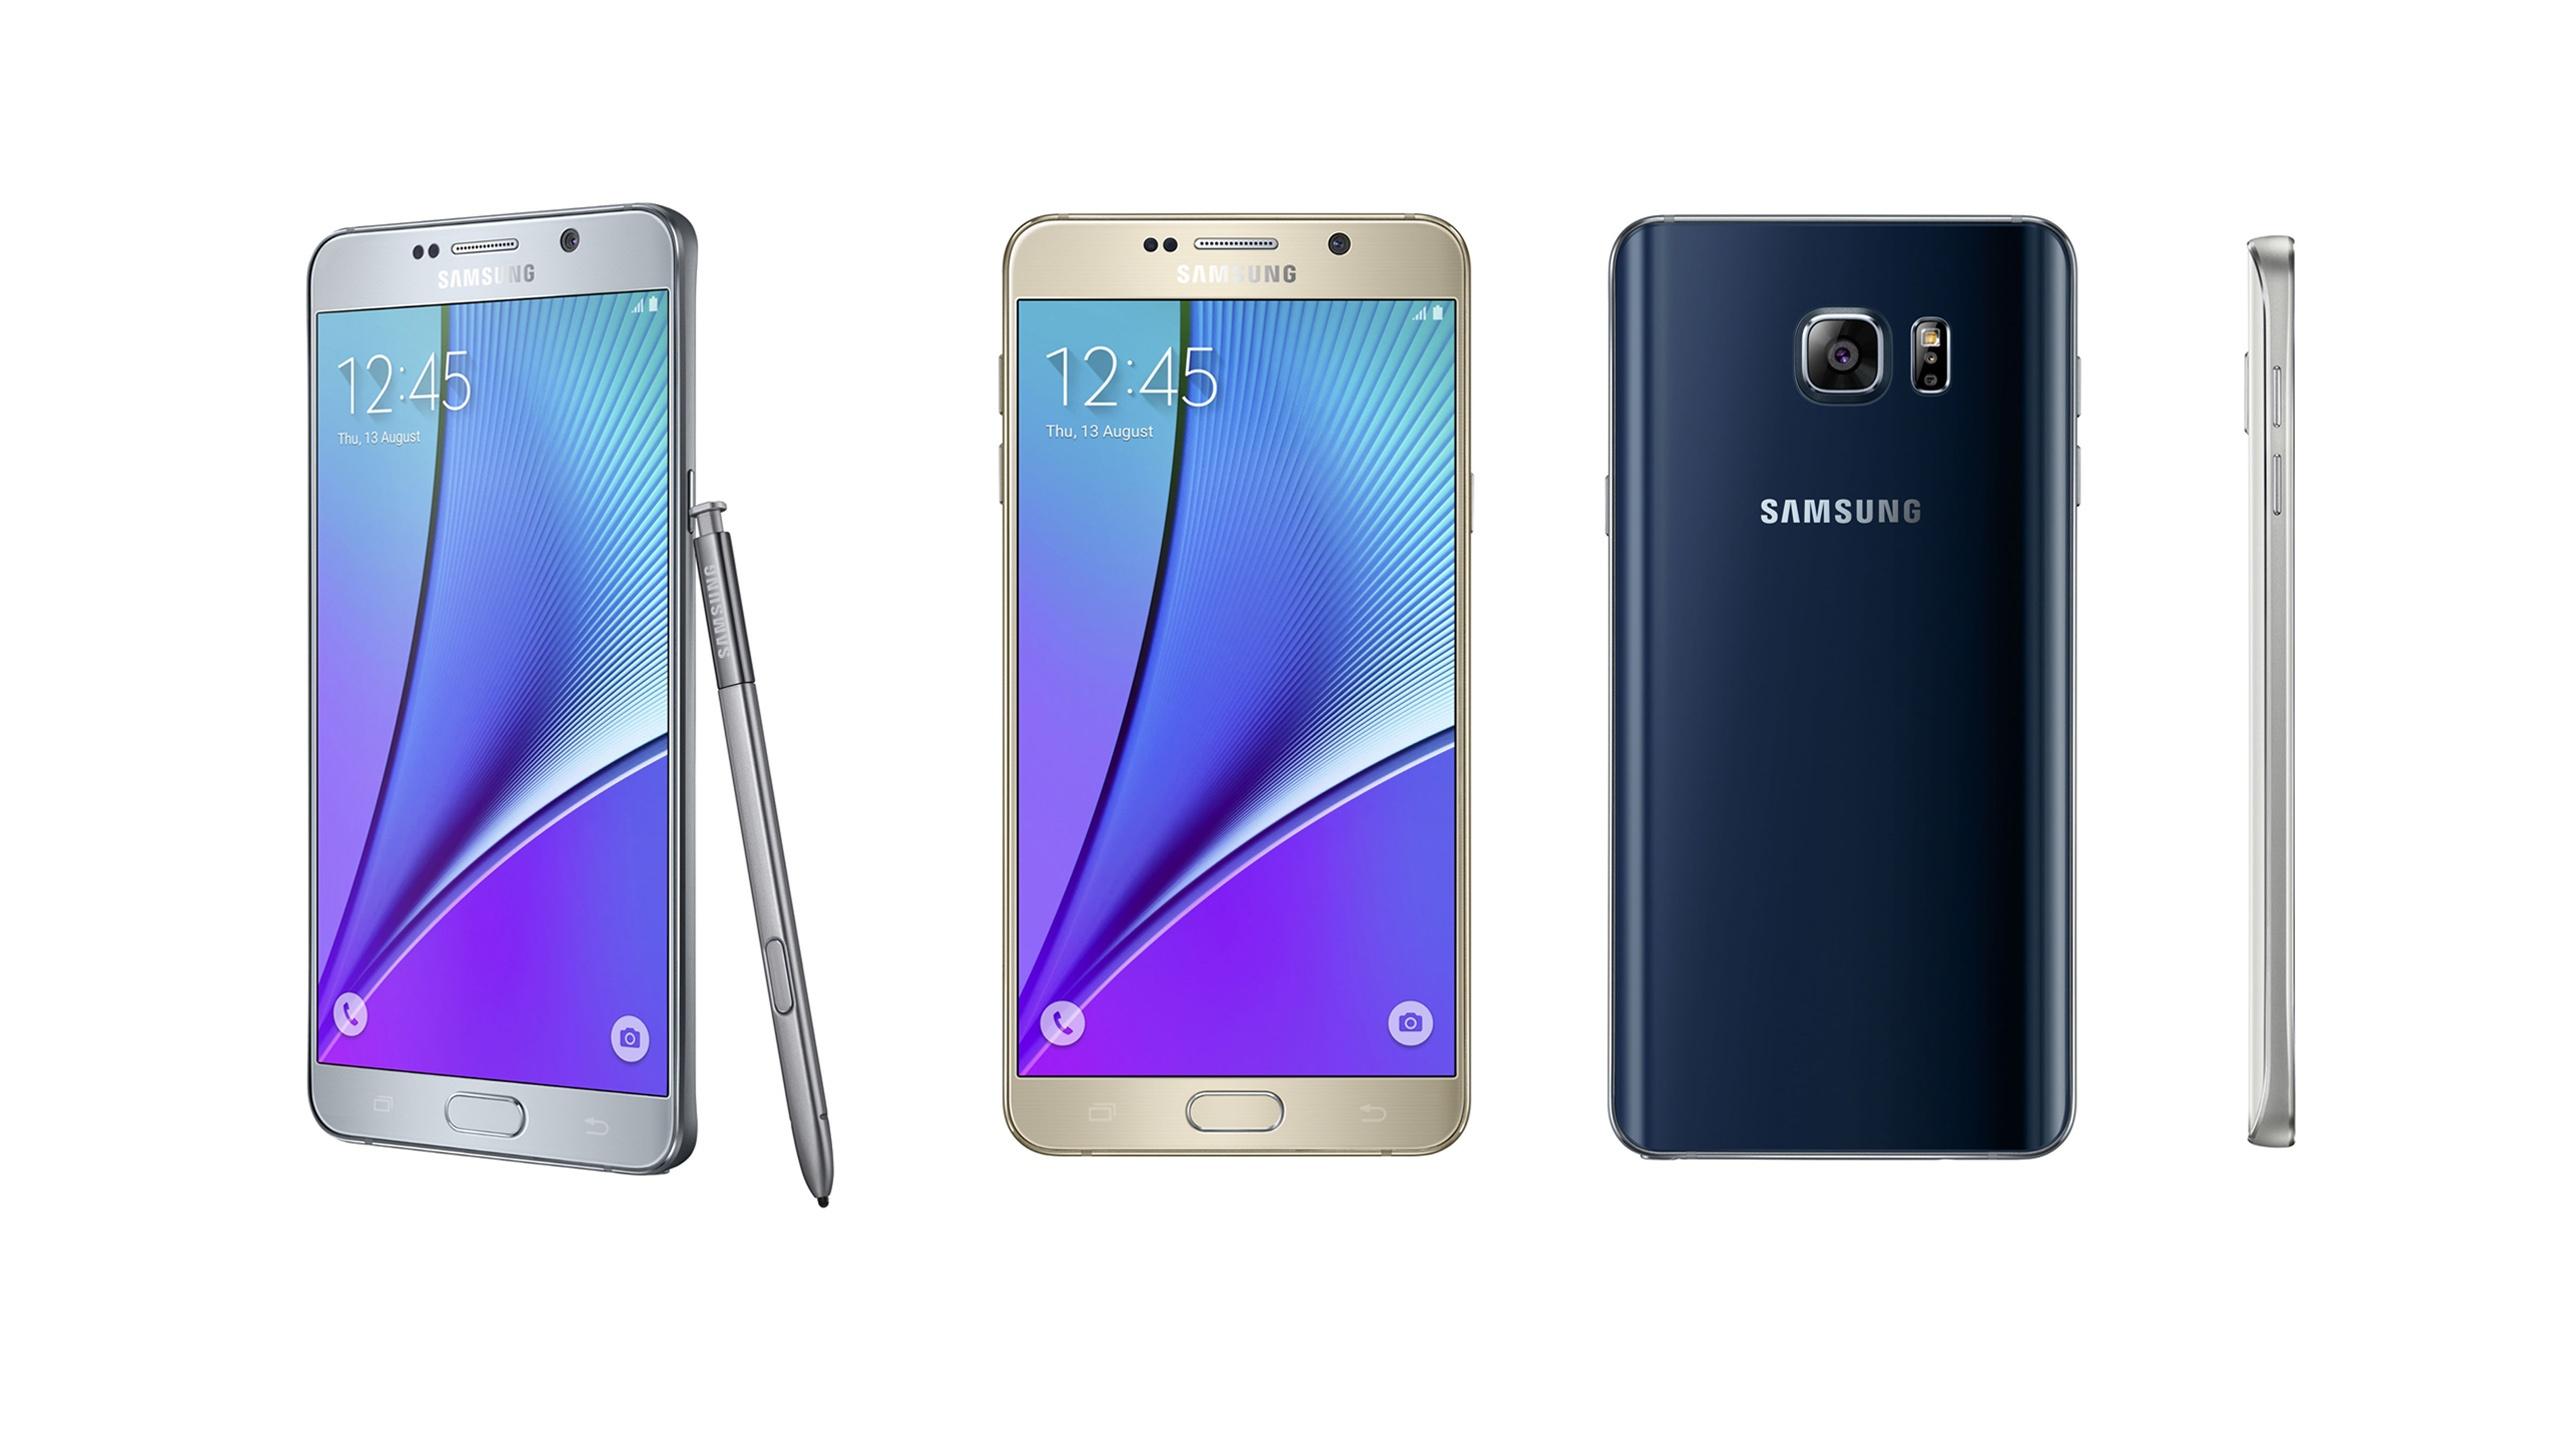 Samsung Galaxy Note 5 Hd Wallpaper: Galaxy Note Wallpapers HD